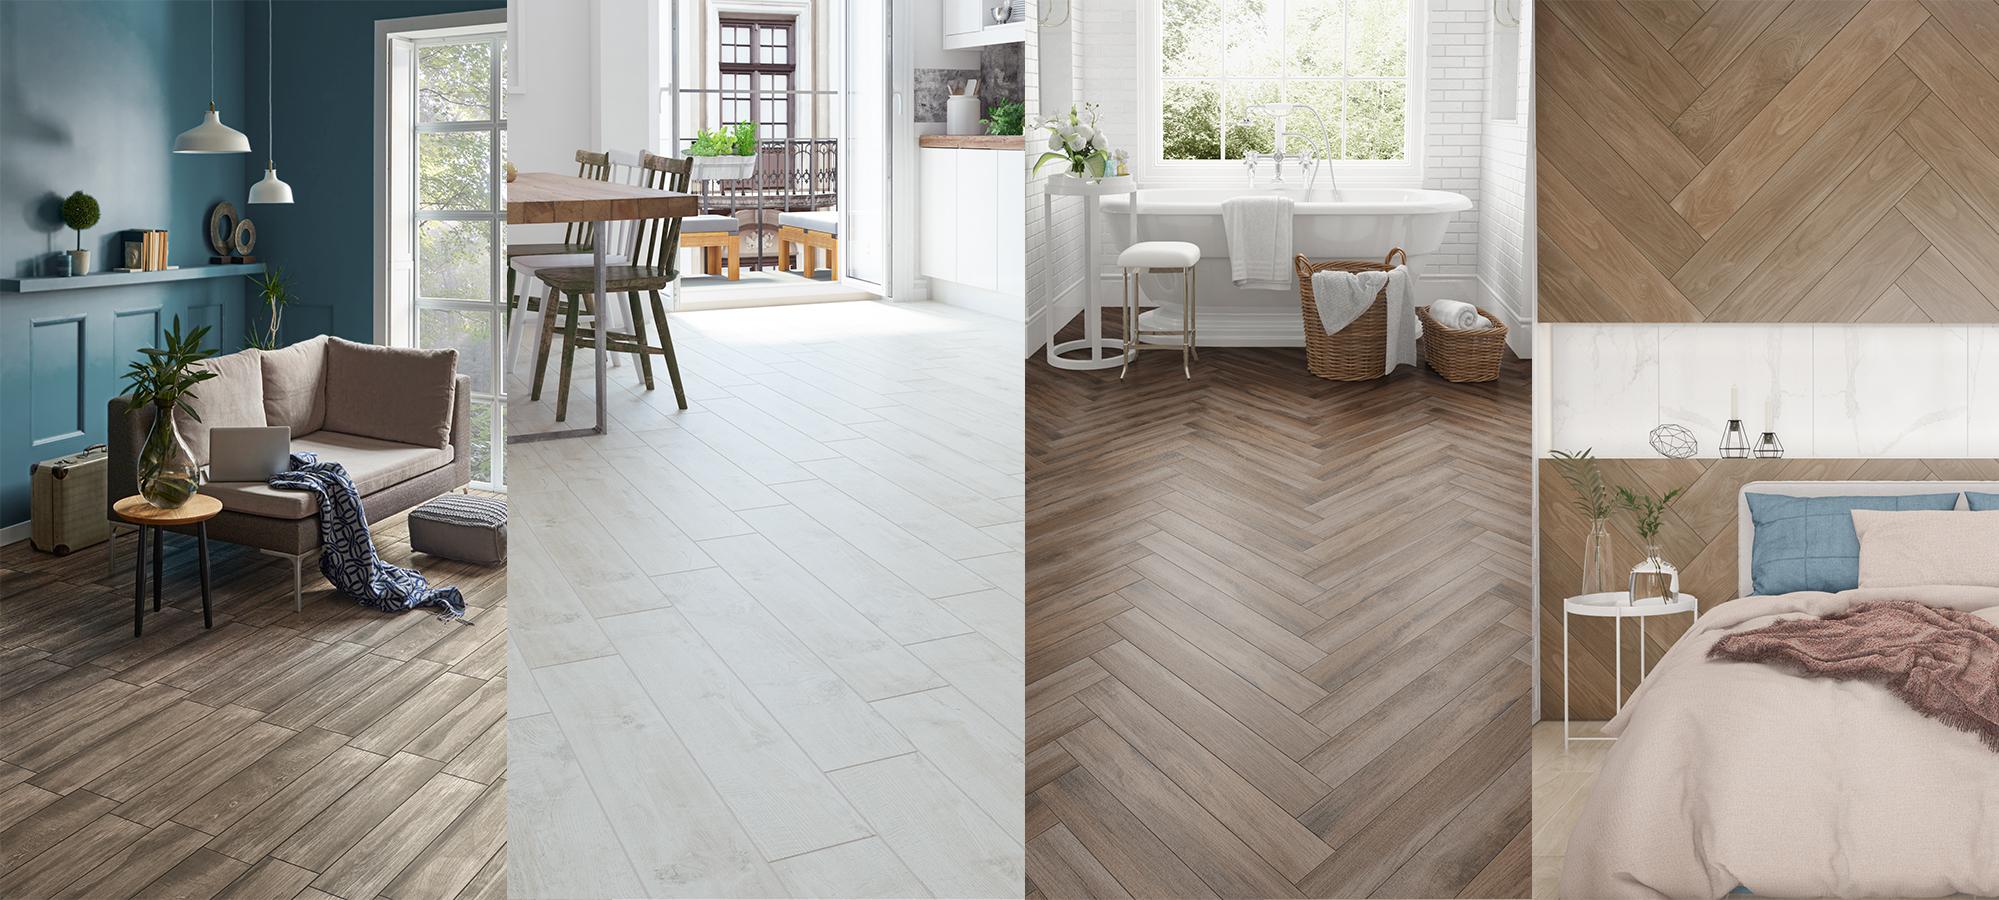 Wood design tiles